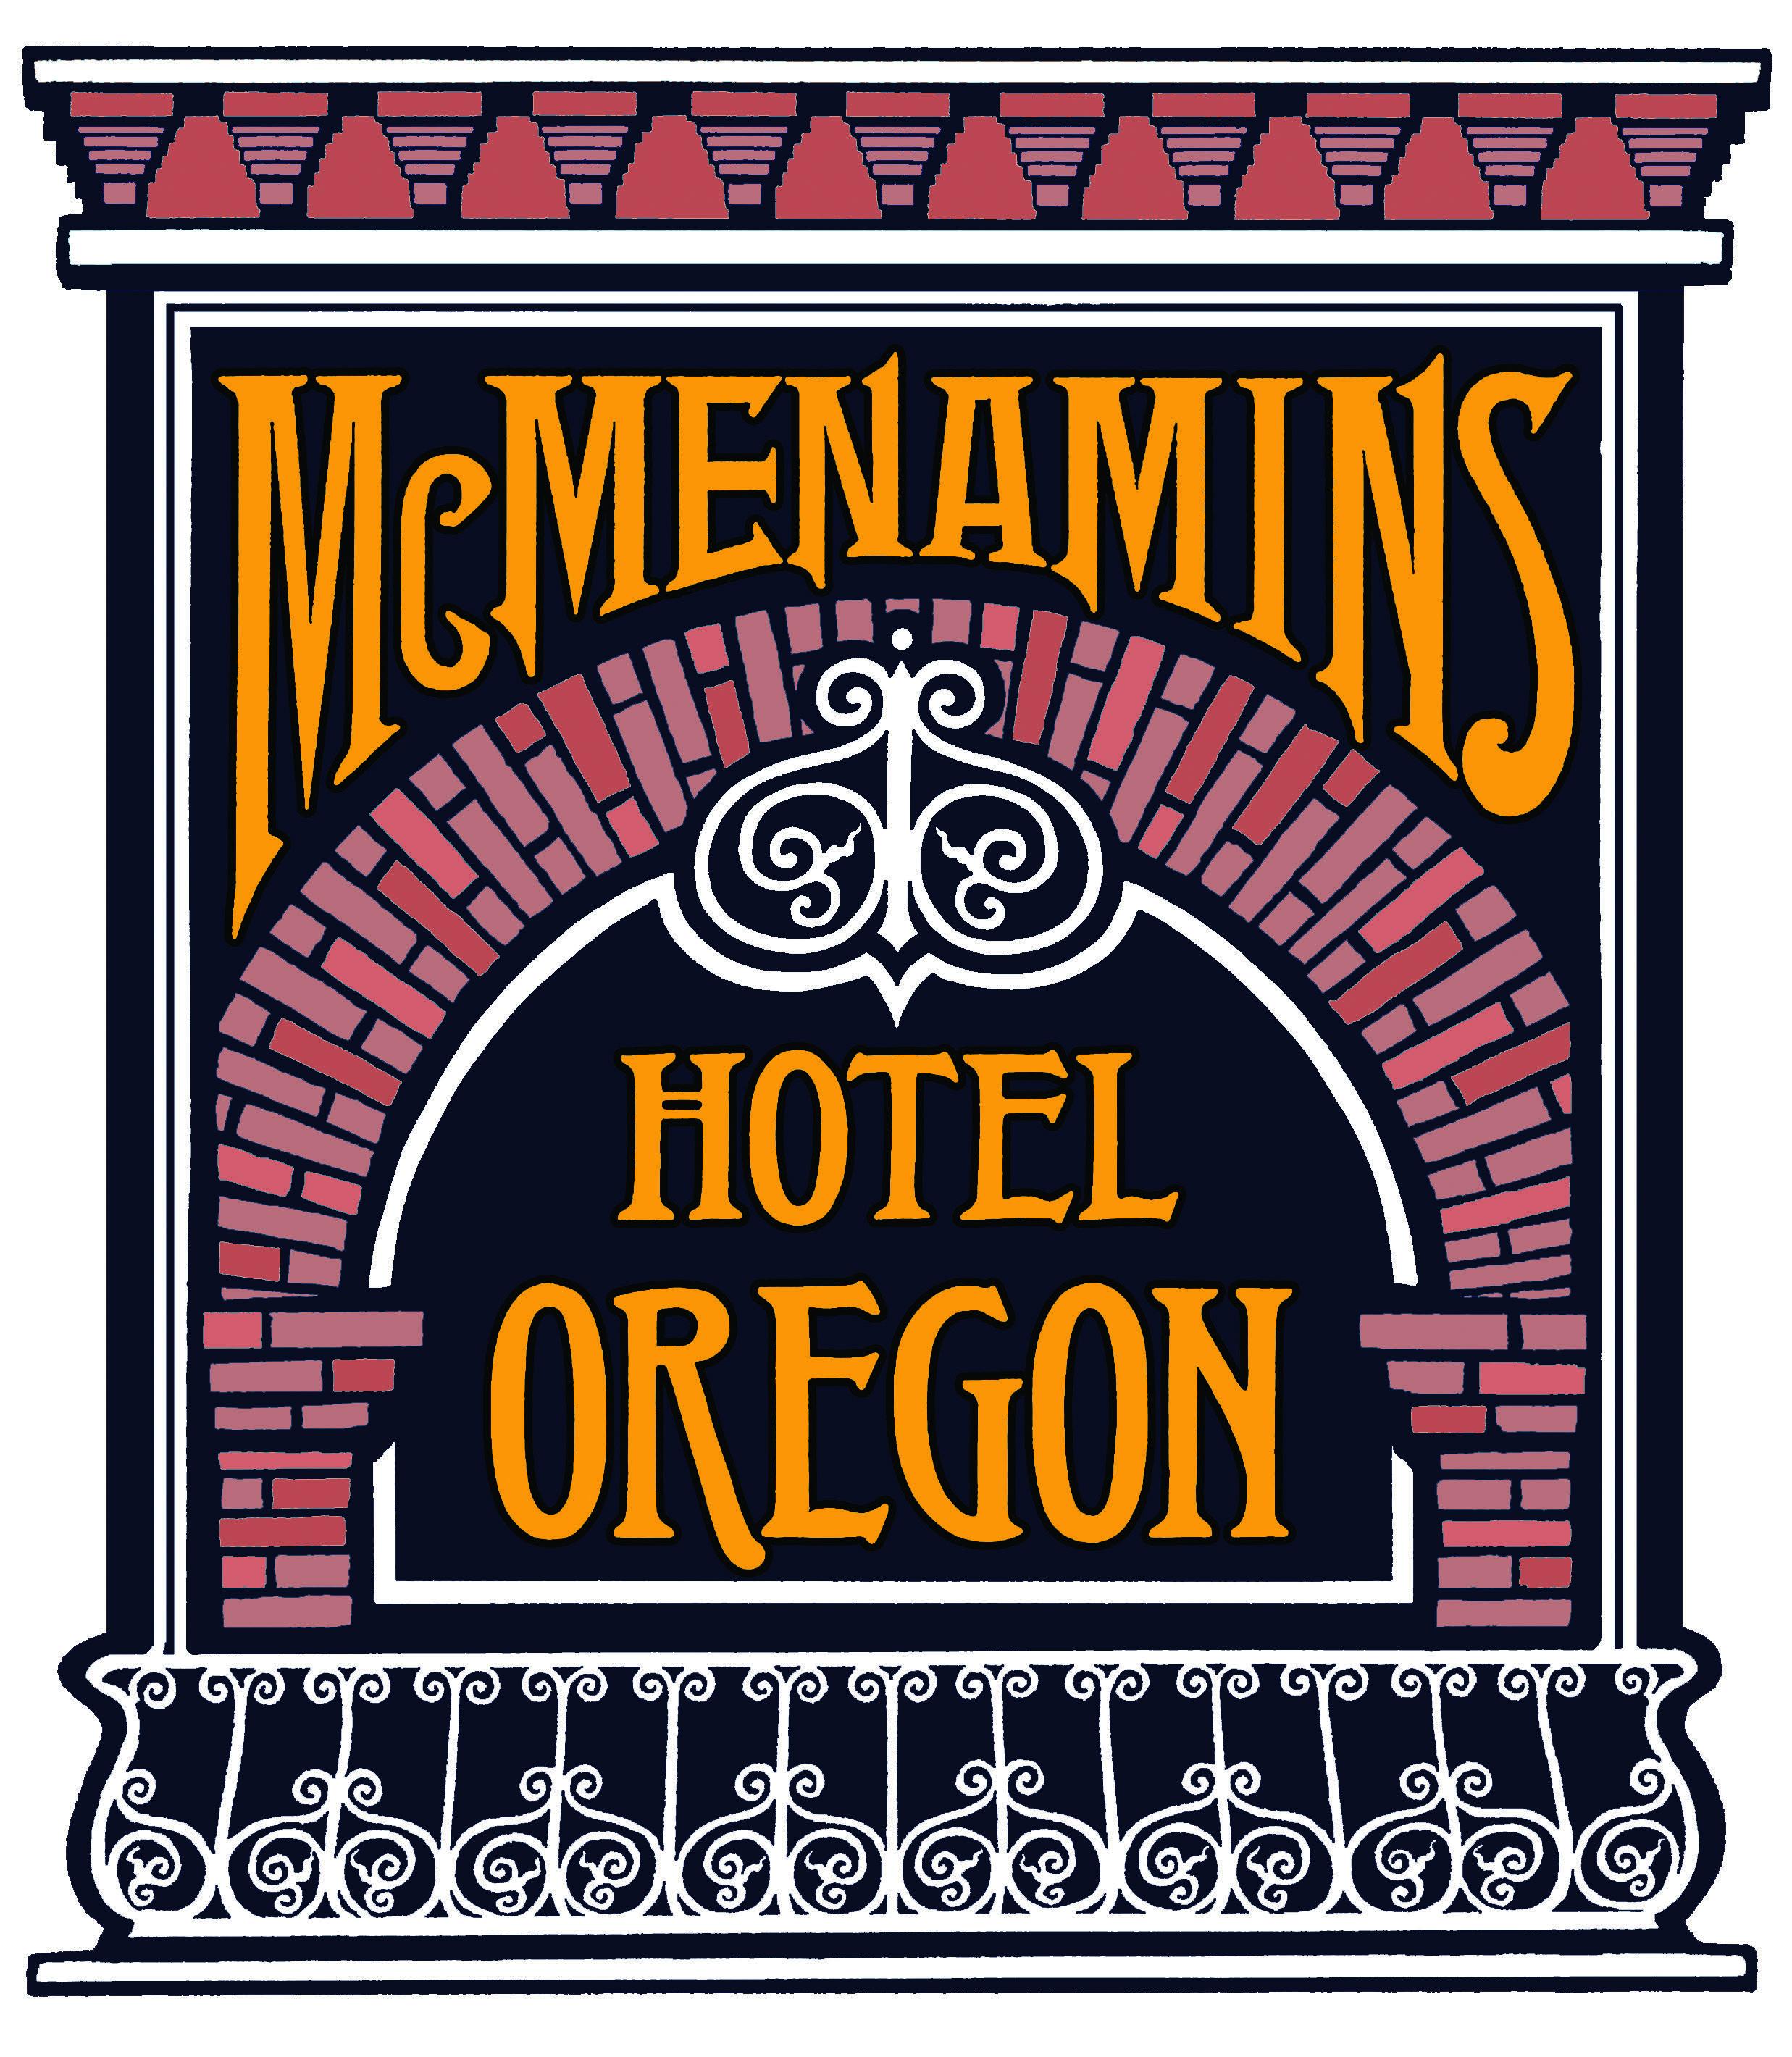 McMenamins Hotel Oregon.jpg